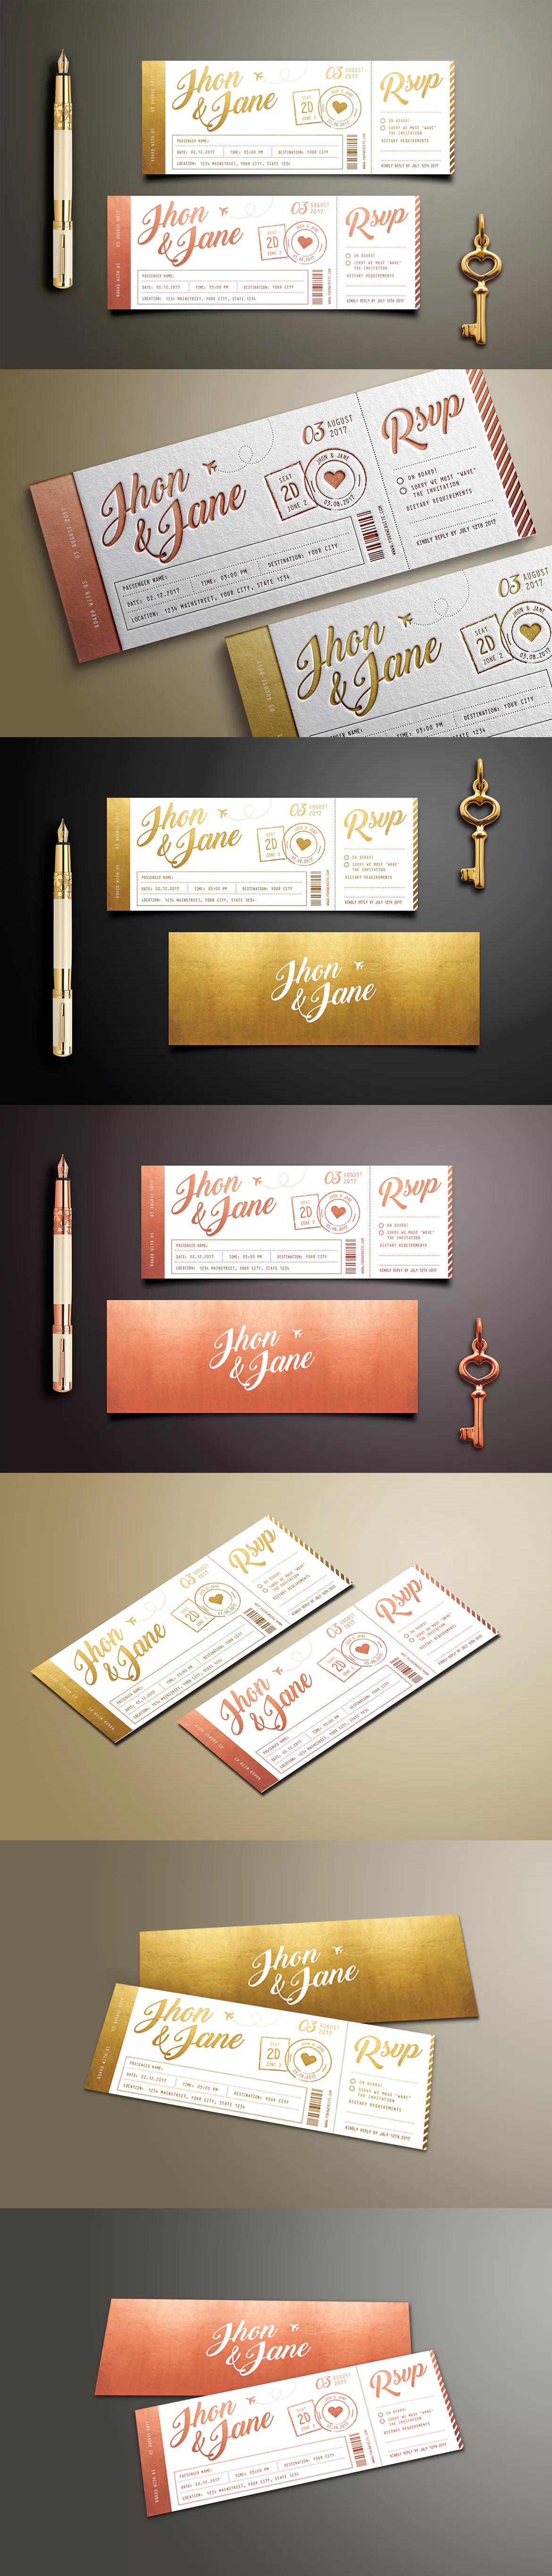 Elegant Gold Wedding Invitation Ticket Template PSD Wedding - Wedding invitation templates: wedding invitation ticket template